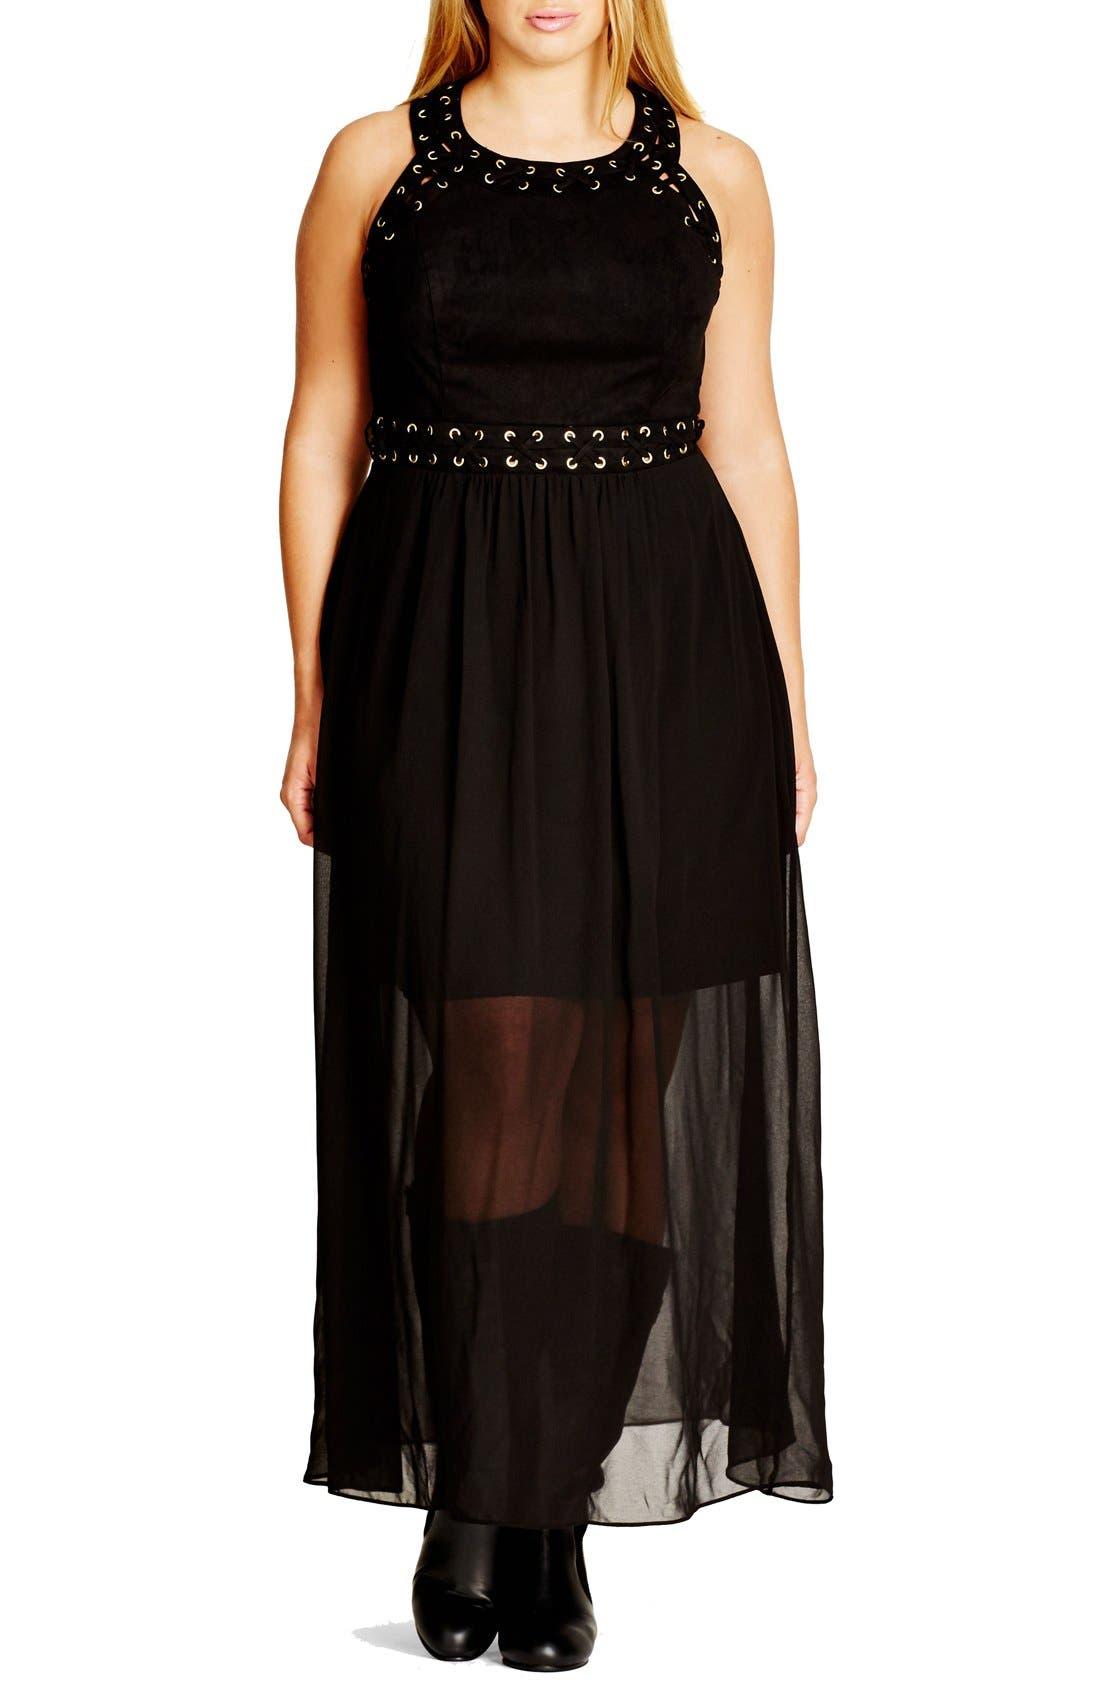 Main Image - City Chic 'Rhianna' Lace-Up Trim Faux Suede & Chiffon Maxi Dress (Plus Size)